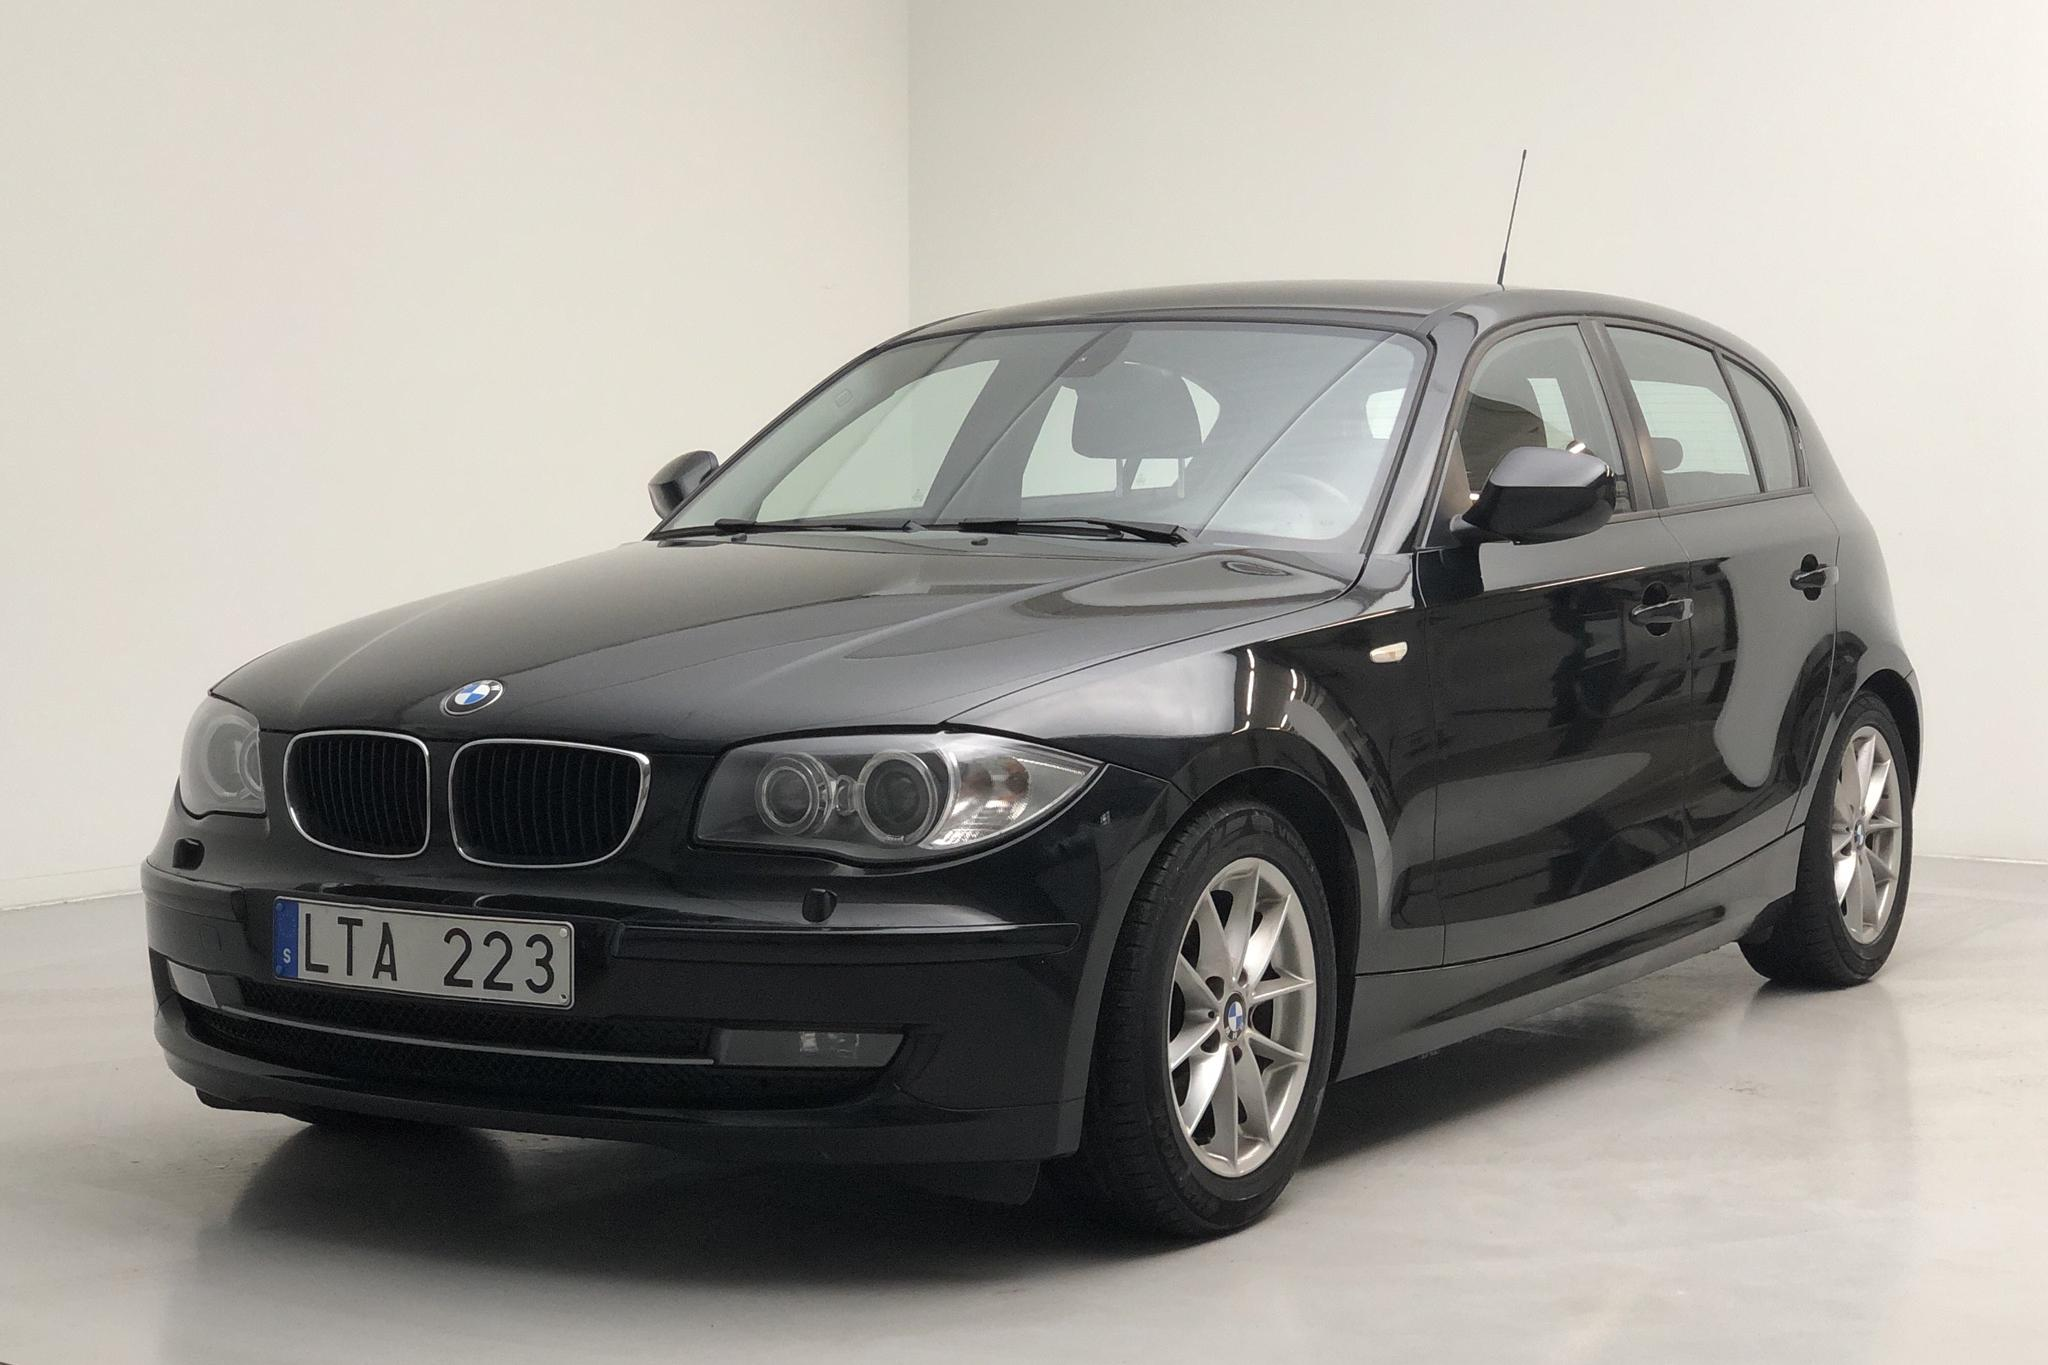 BMW 118d 5dr, E87 (143hk) - 14 173 mil - Manuell - svart - 2011